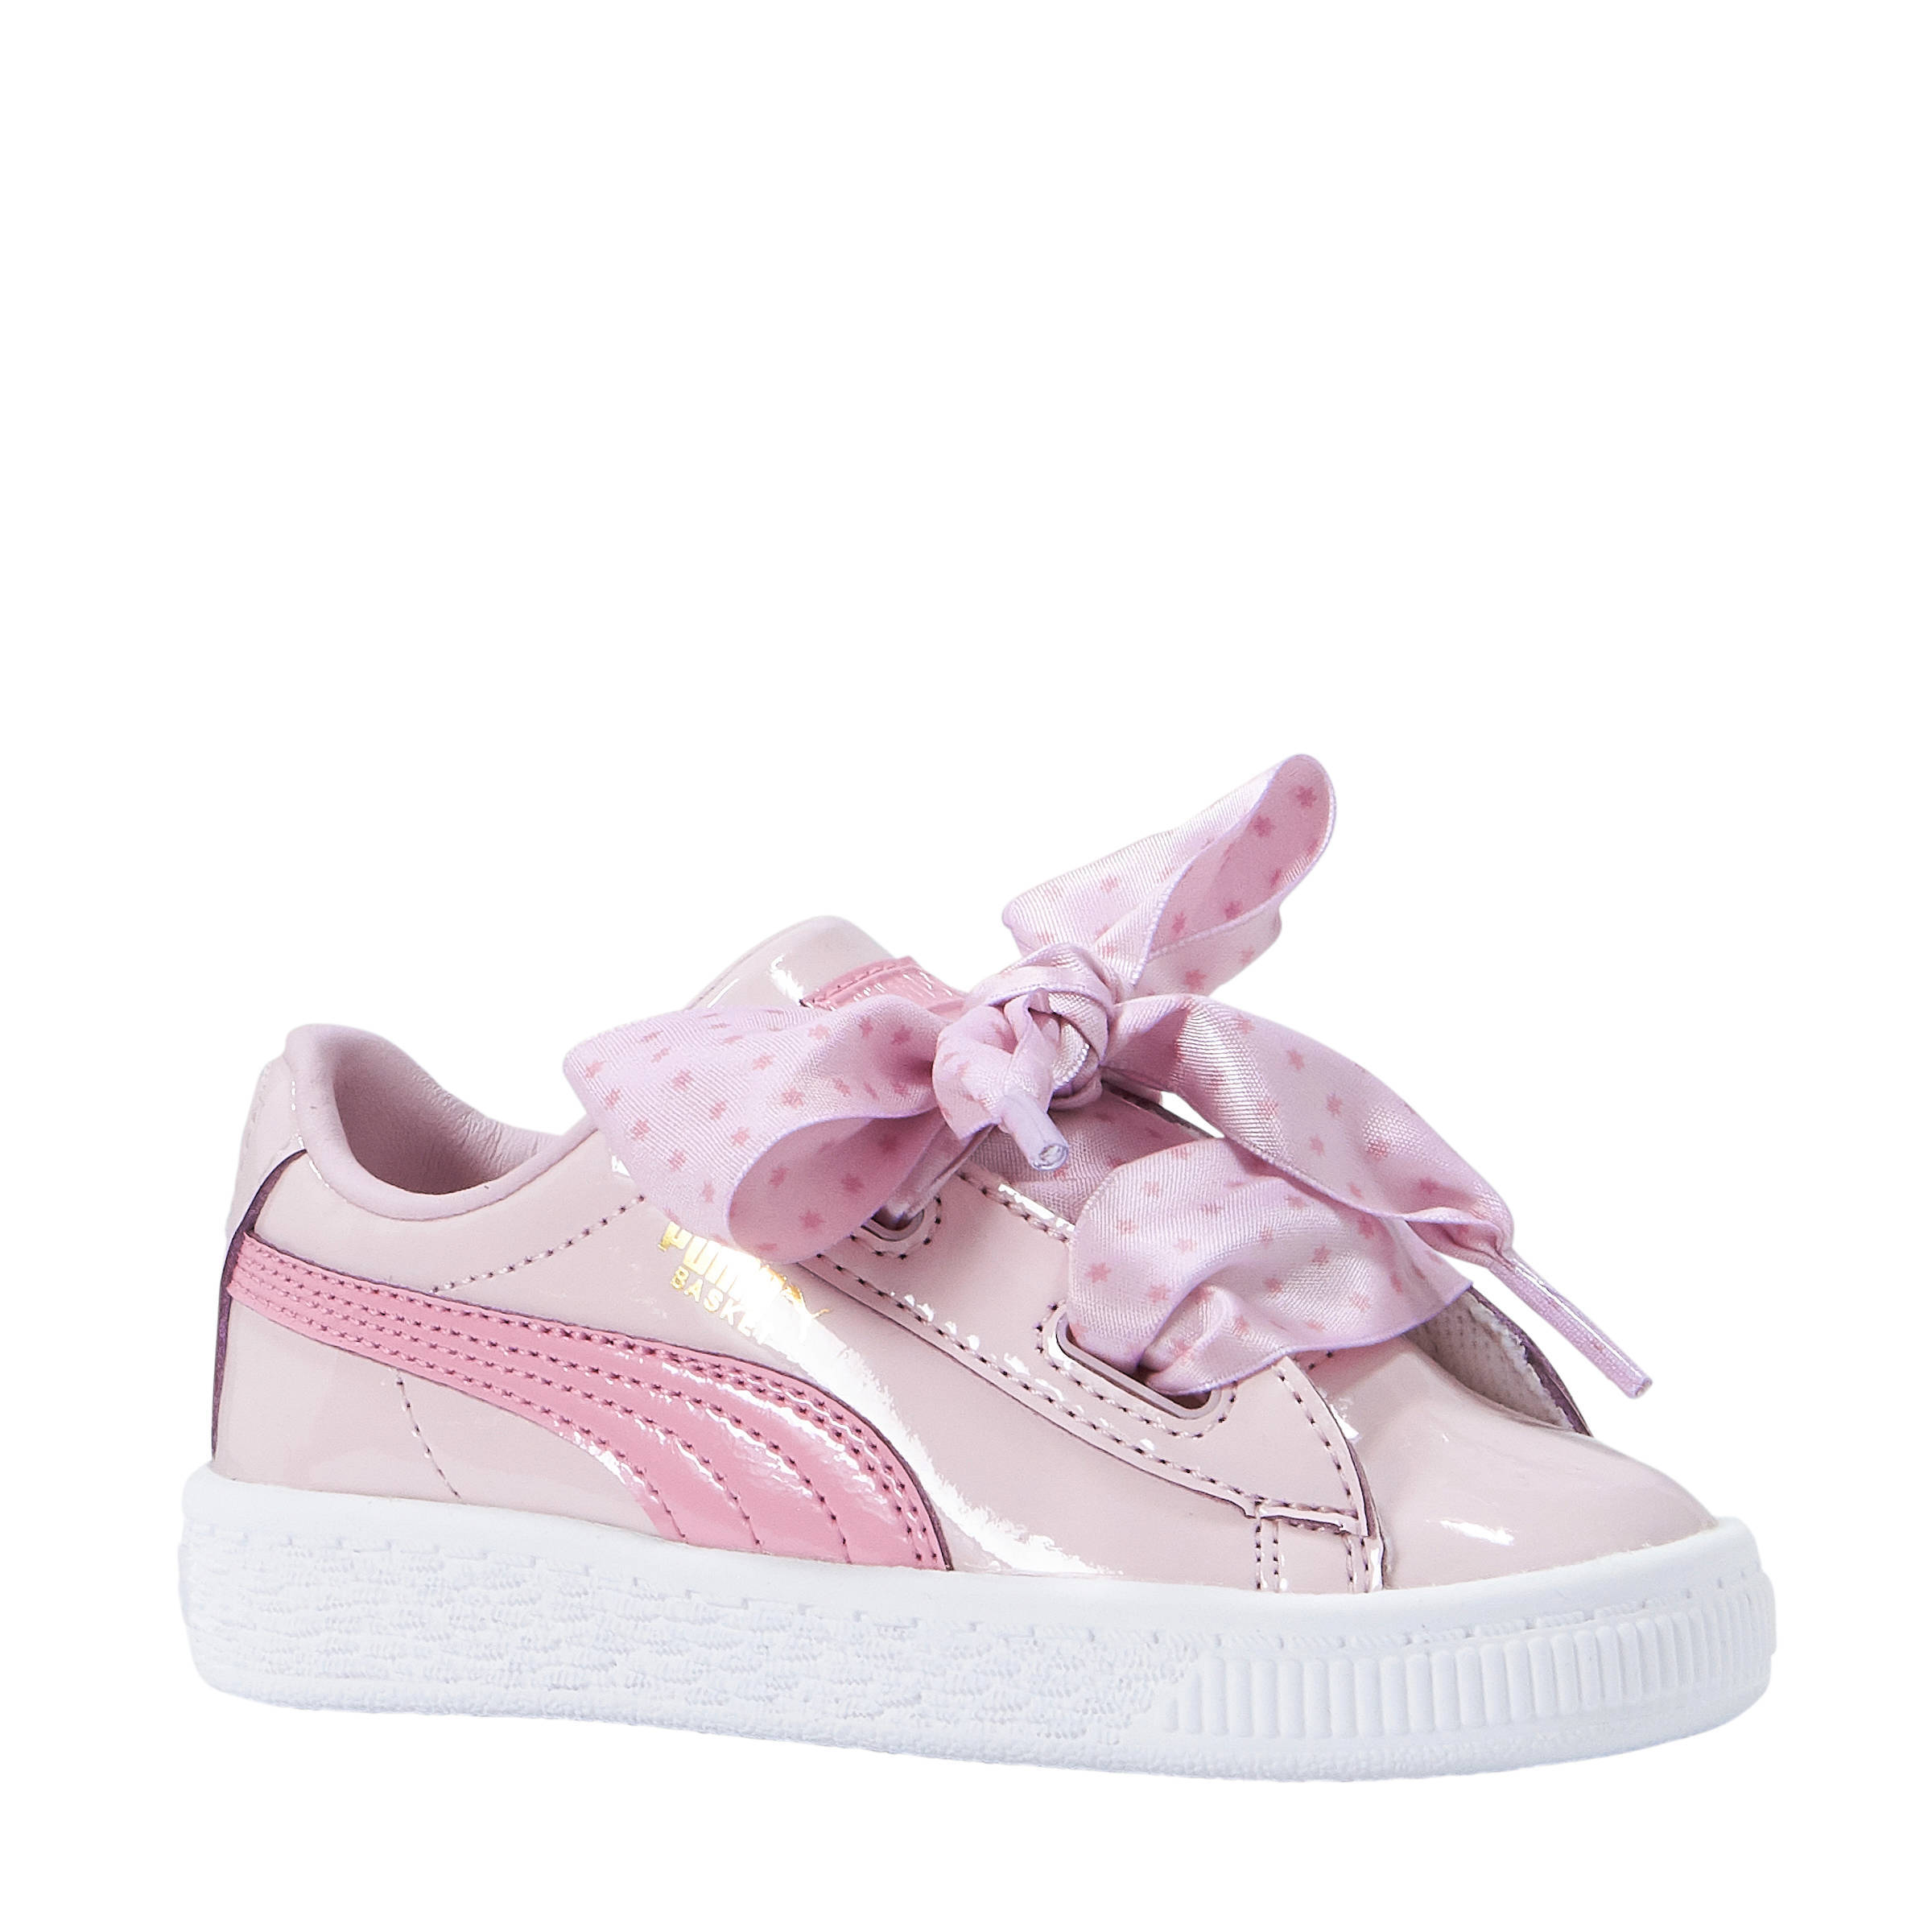 separation shoes 4da8c ace79 Basket Puma Inf Wehkamp Lila Heart Sneakers Stars Owpgwqn4 r